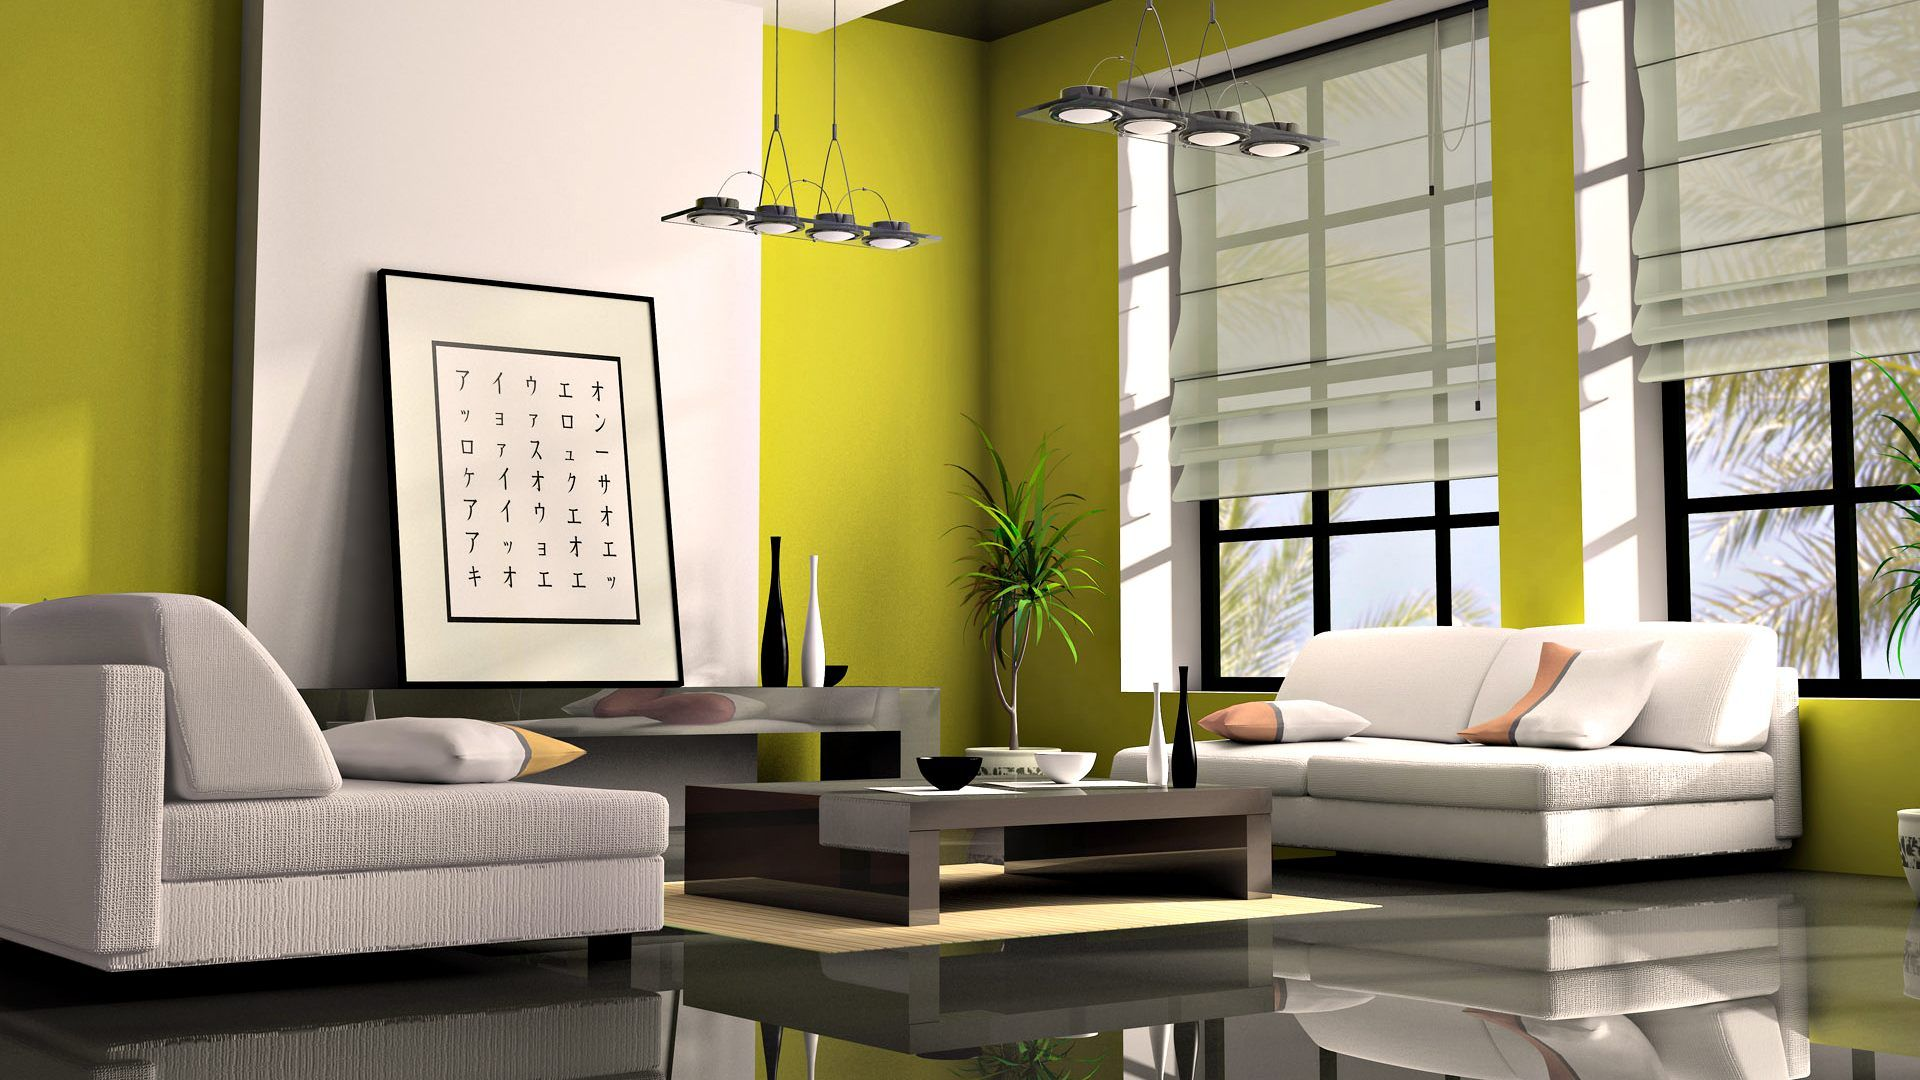 Unique Floor Couch Inspiredjapanese Home Interior Design Prepossessing Japanese Living Room Review